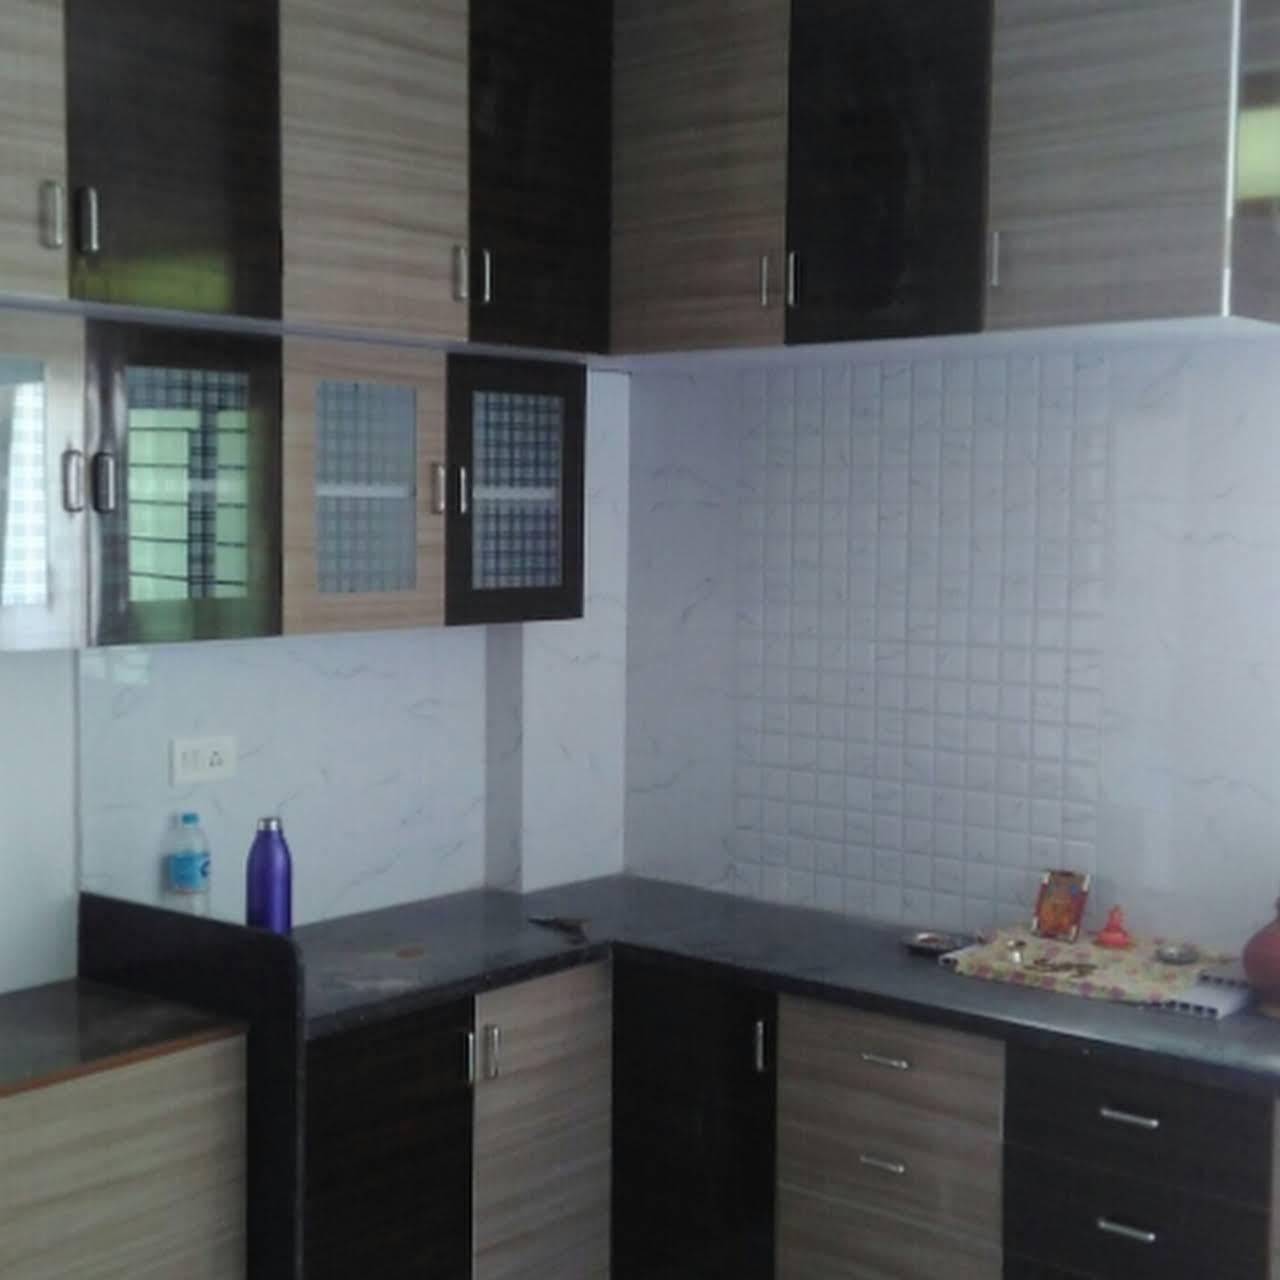 Furniturewala - Furniture Store in Vadodara